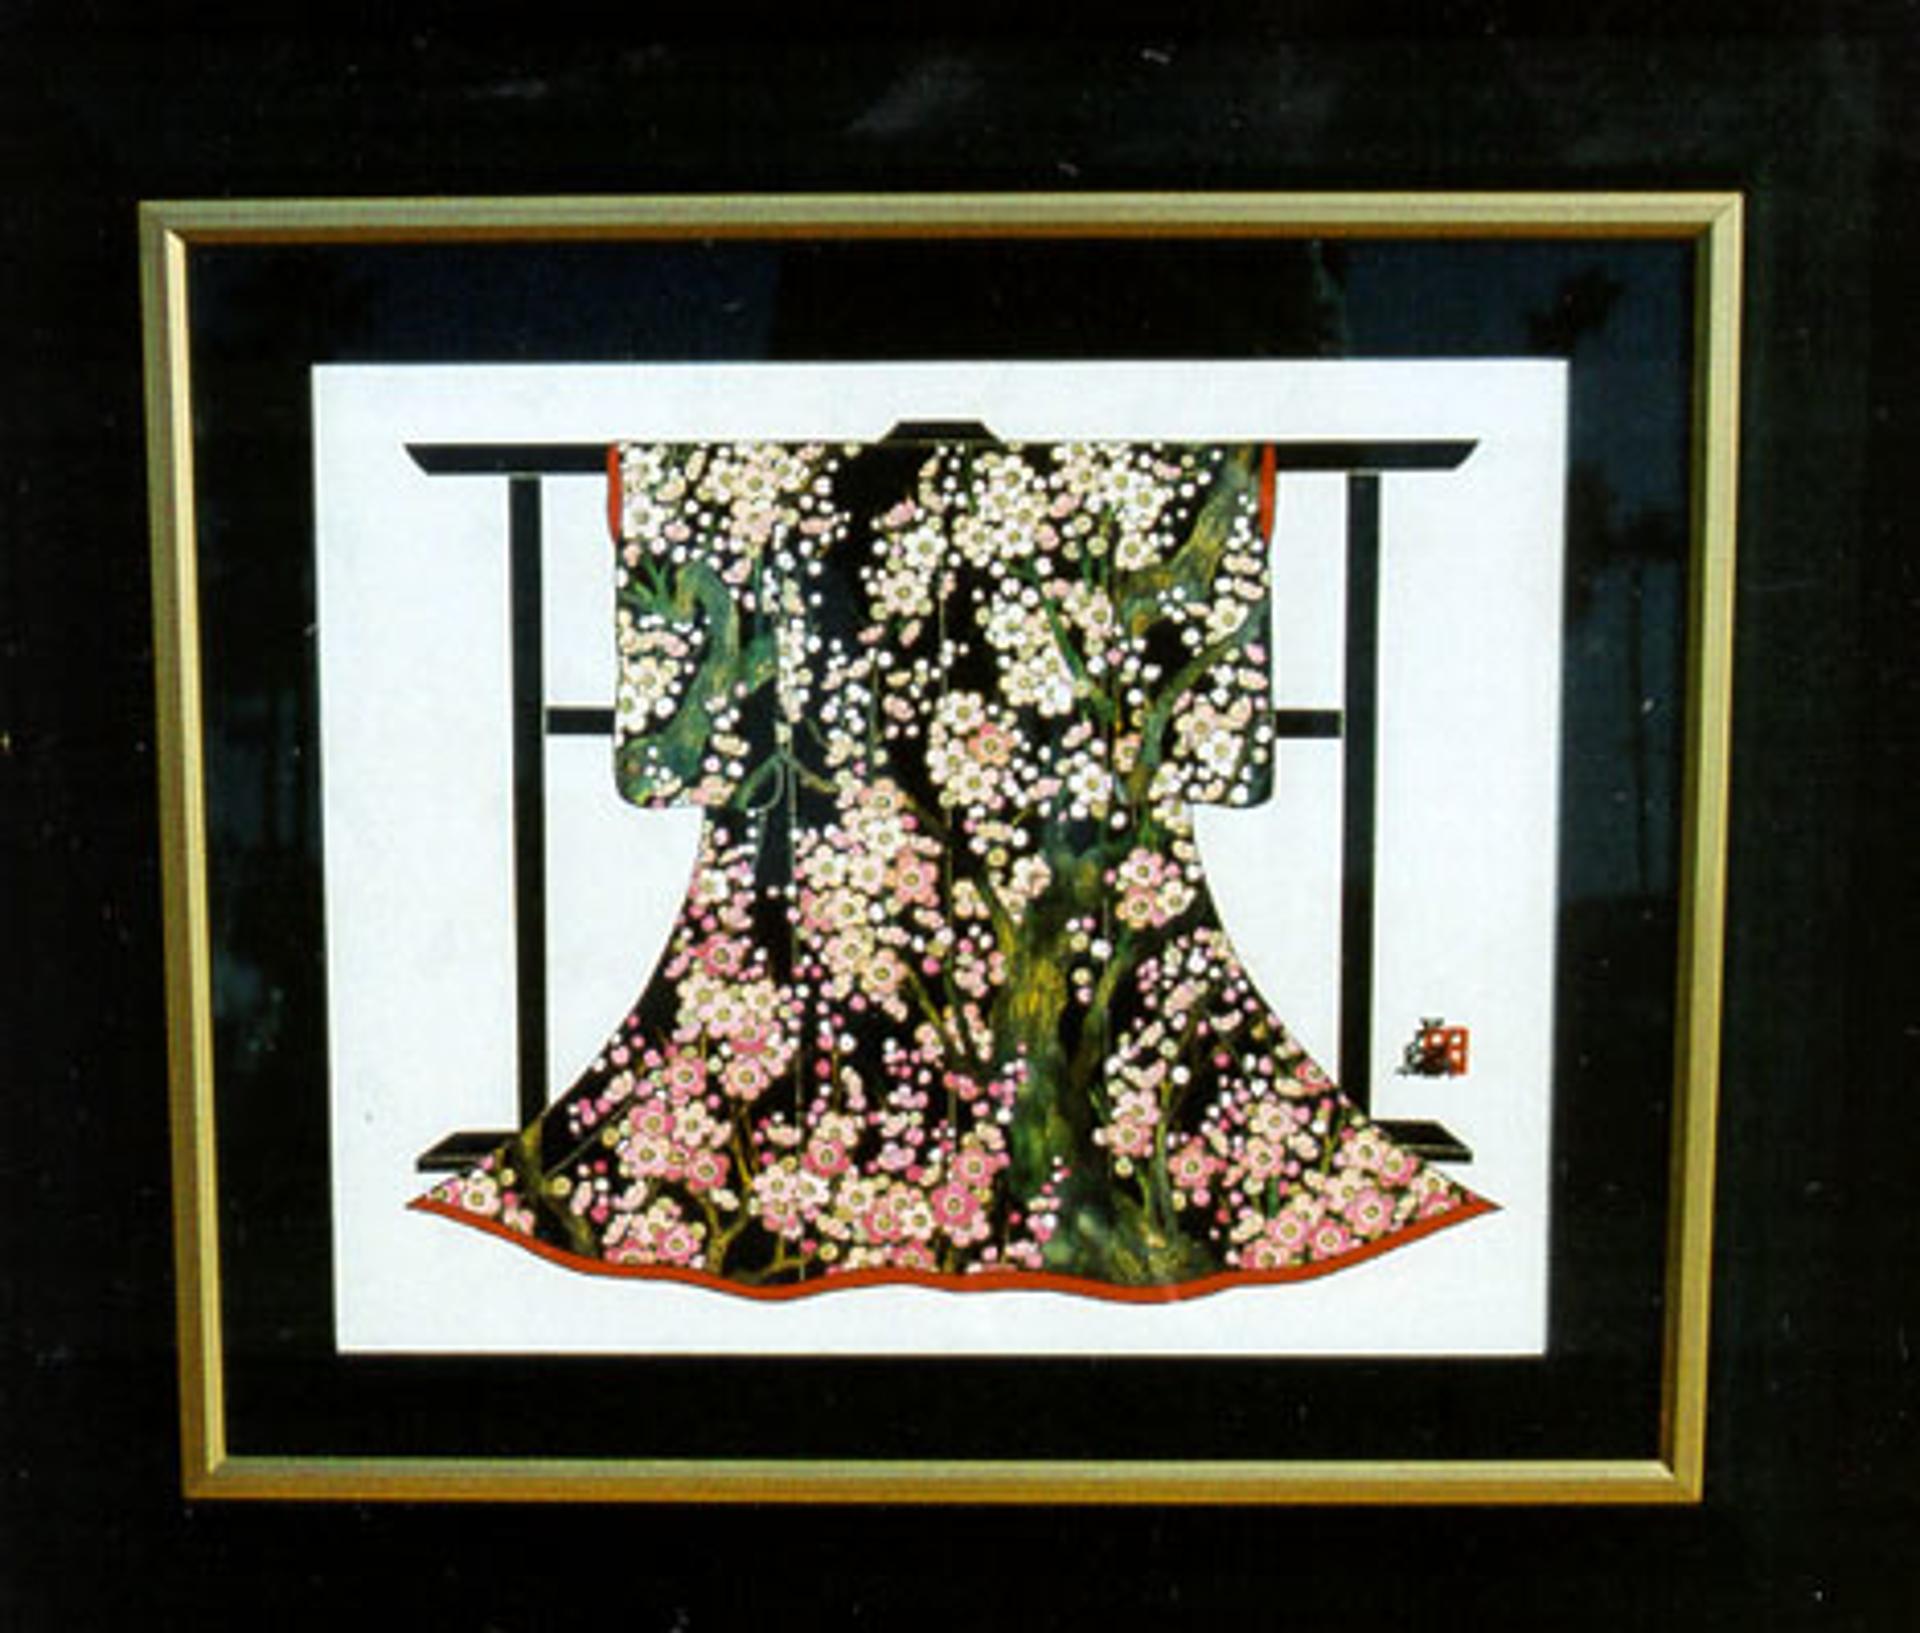 Kimono With Plum Tree by Hisashi Otsuka